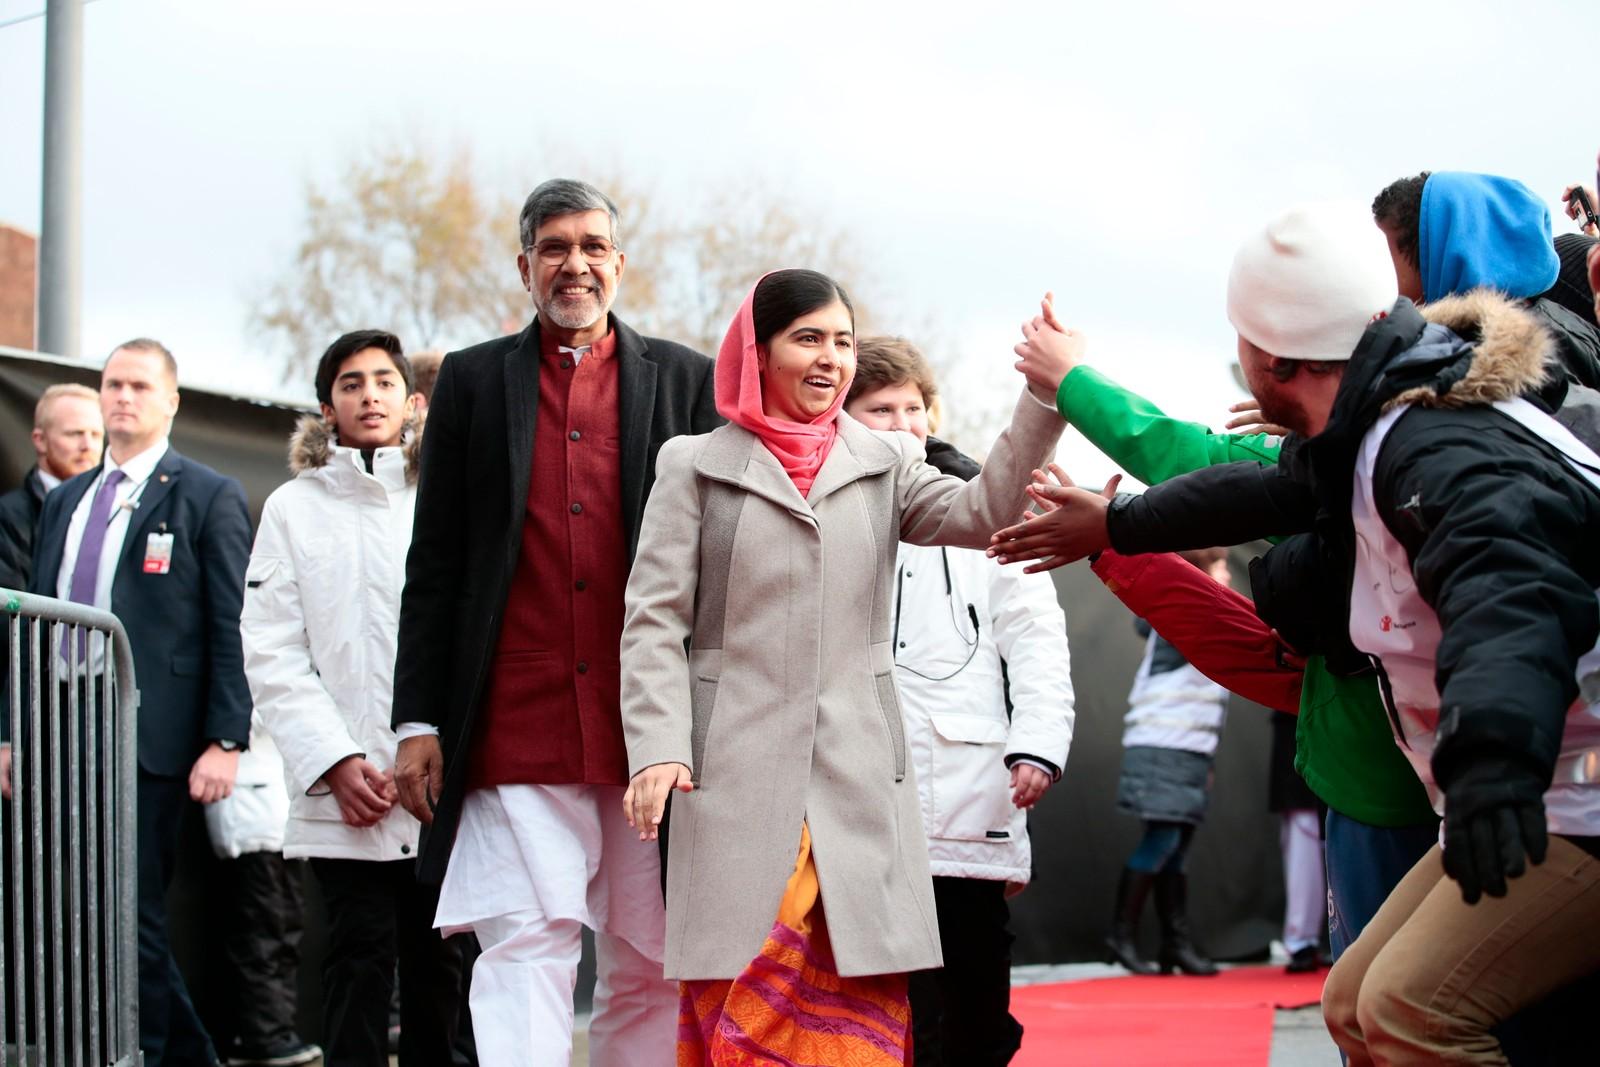 SLÅ DEN: Fredsprisvinnerne Malala Yousafzai og Kailash Satyarthi møter flere tusen skolebarn under Redd Barnas fredsprisfest utenfor Nobels Fredssenter i Oslo onsdag formiddag.